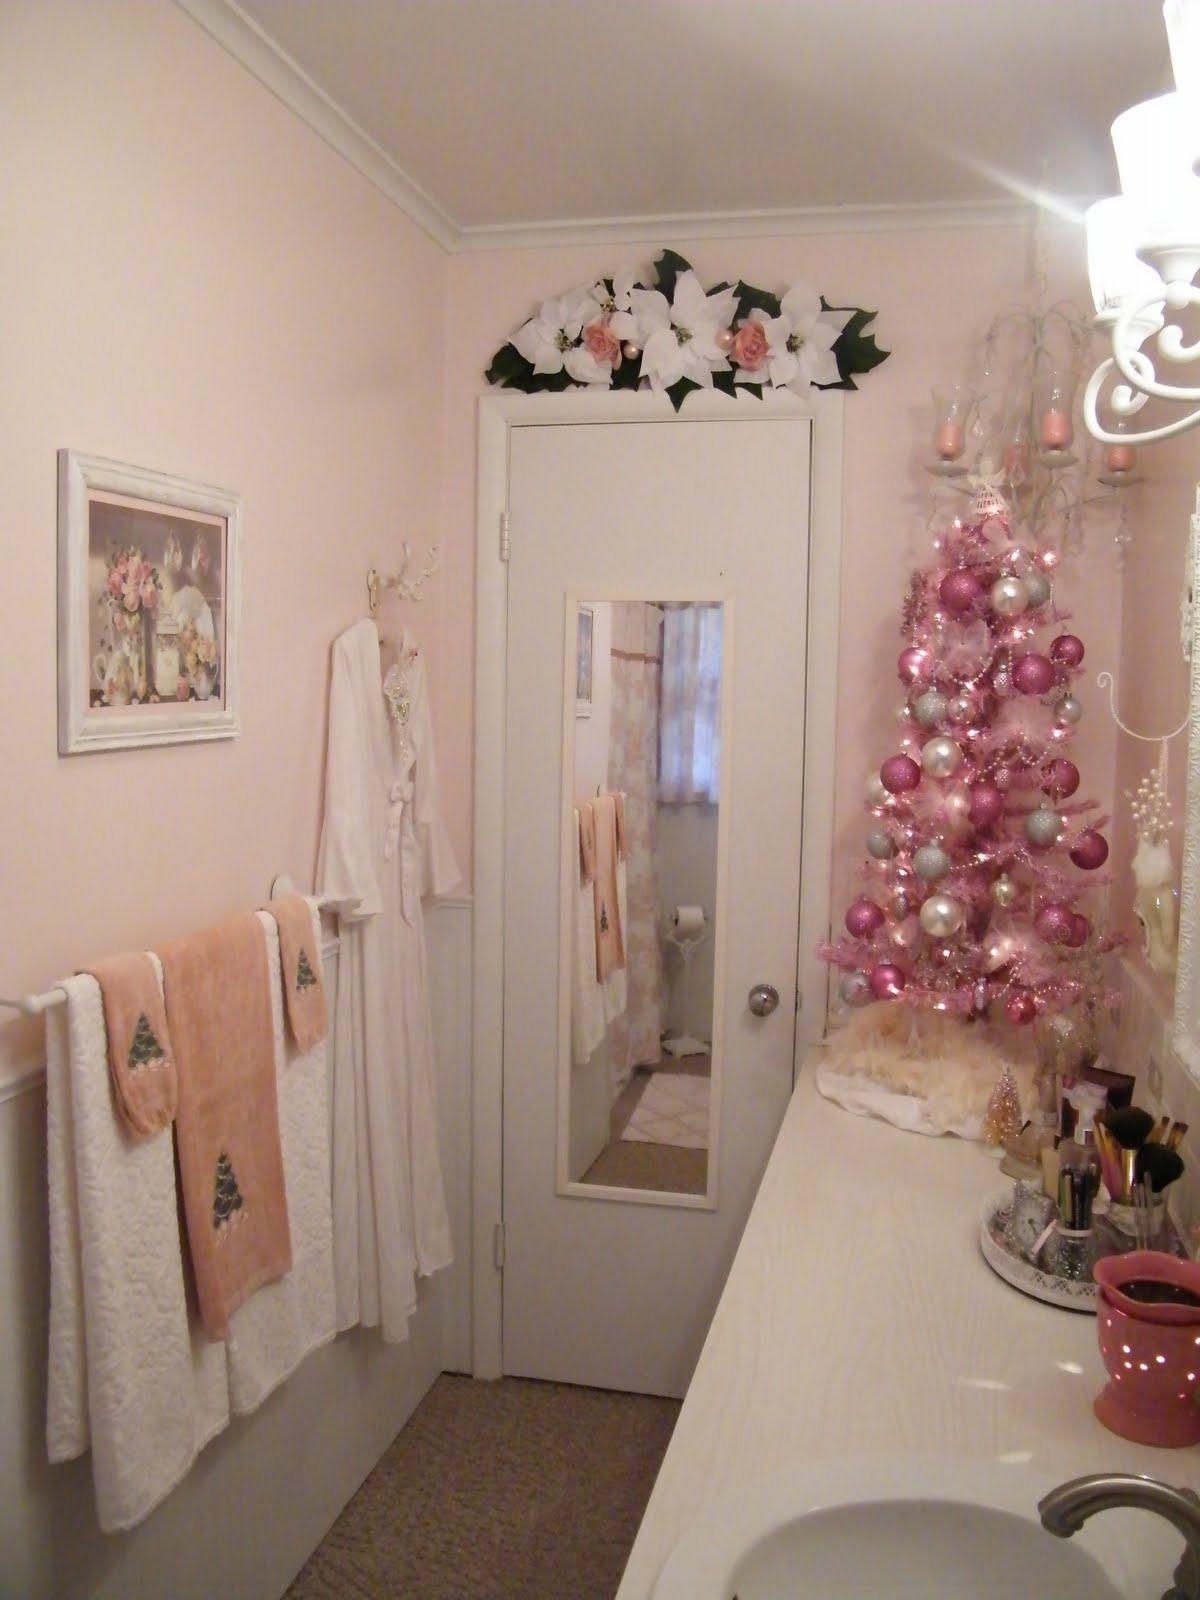 Girly Bathroom Decor 2021 [ 1600 x 1200 Pixel ]